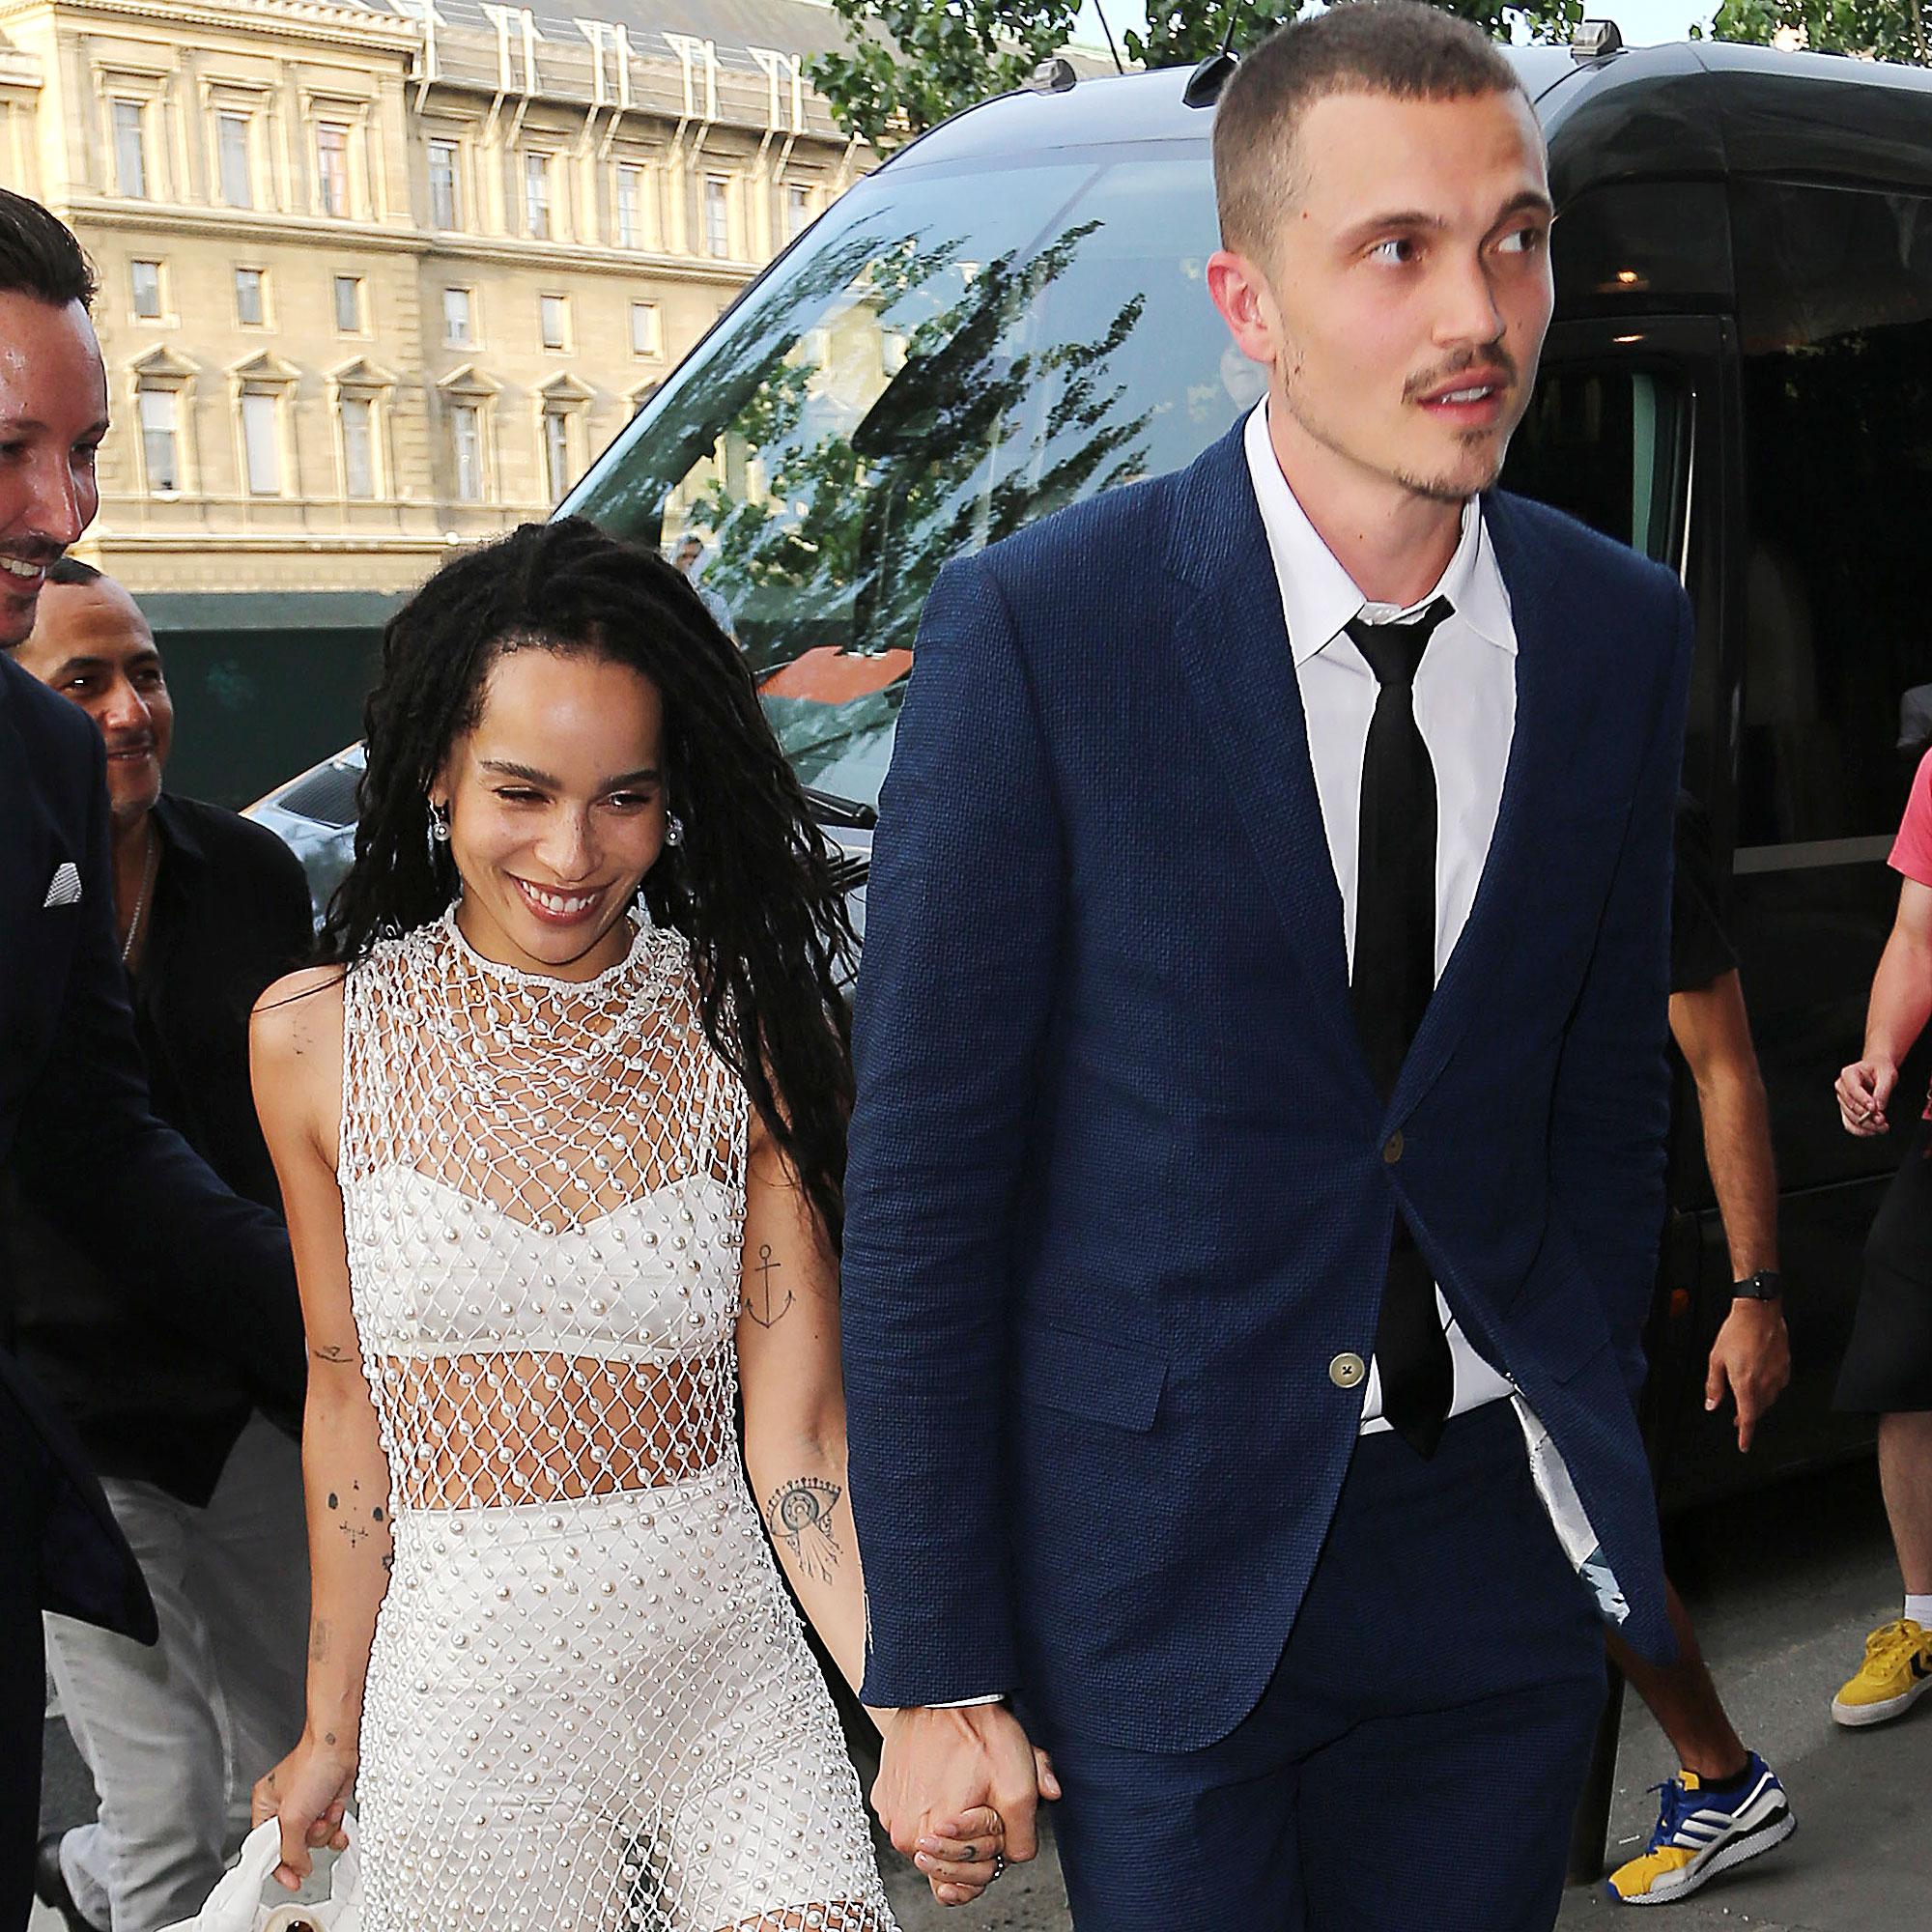 Zoe Kravitz Karl Glusman attend pre-wedding party French restaurant Lapérous Paris - Zoë beamed as she held her spouse's hand outside the Parisian venue.